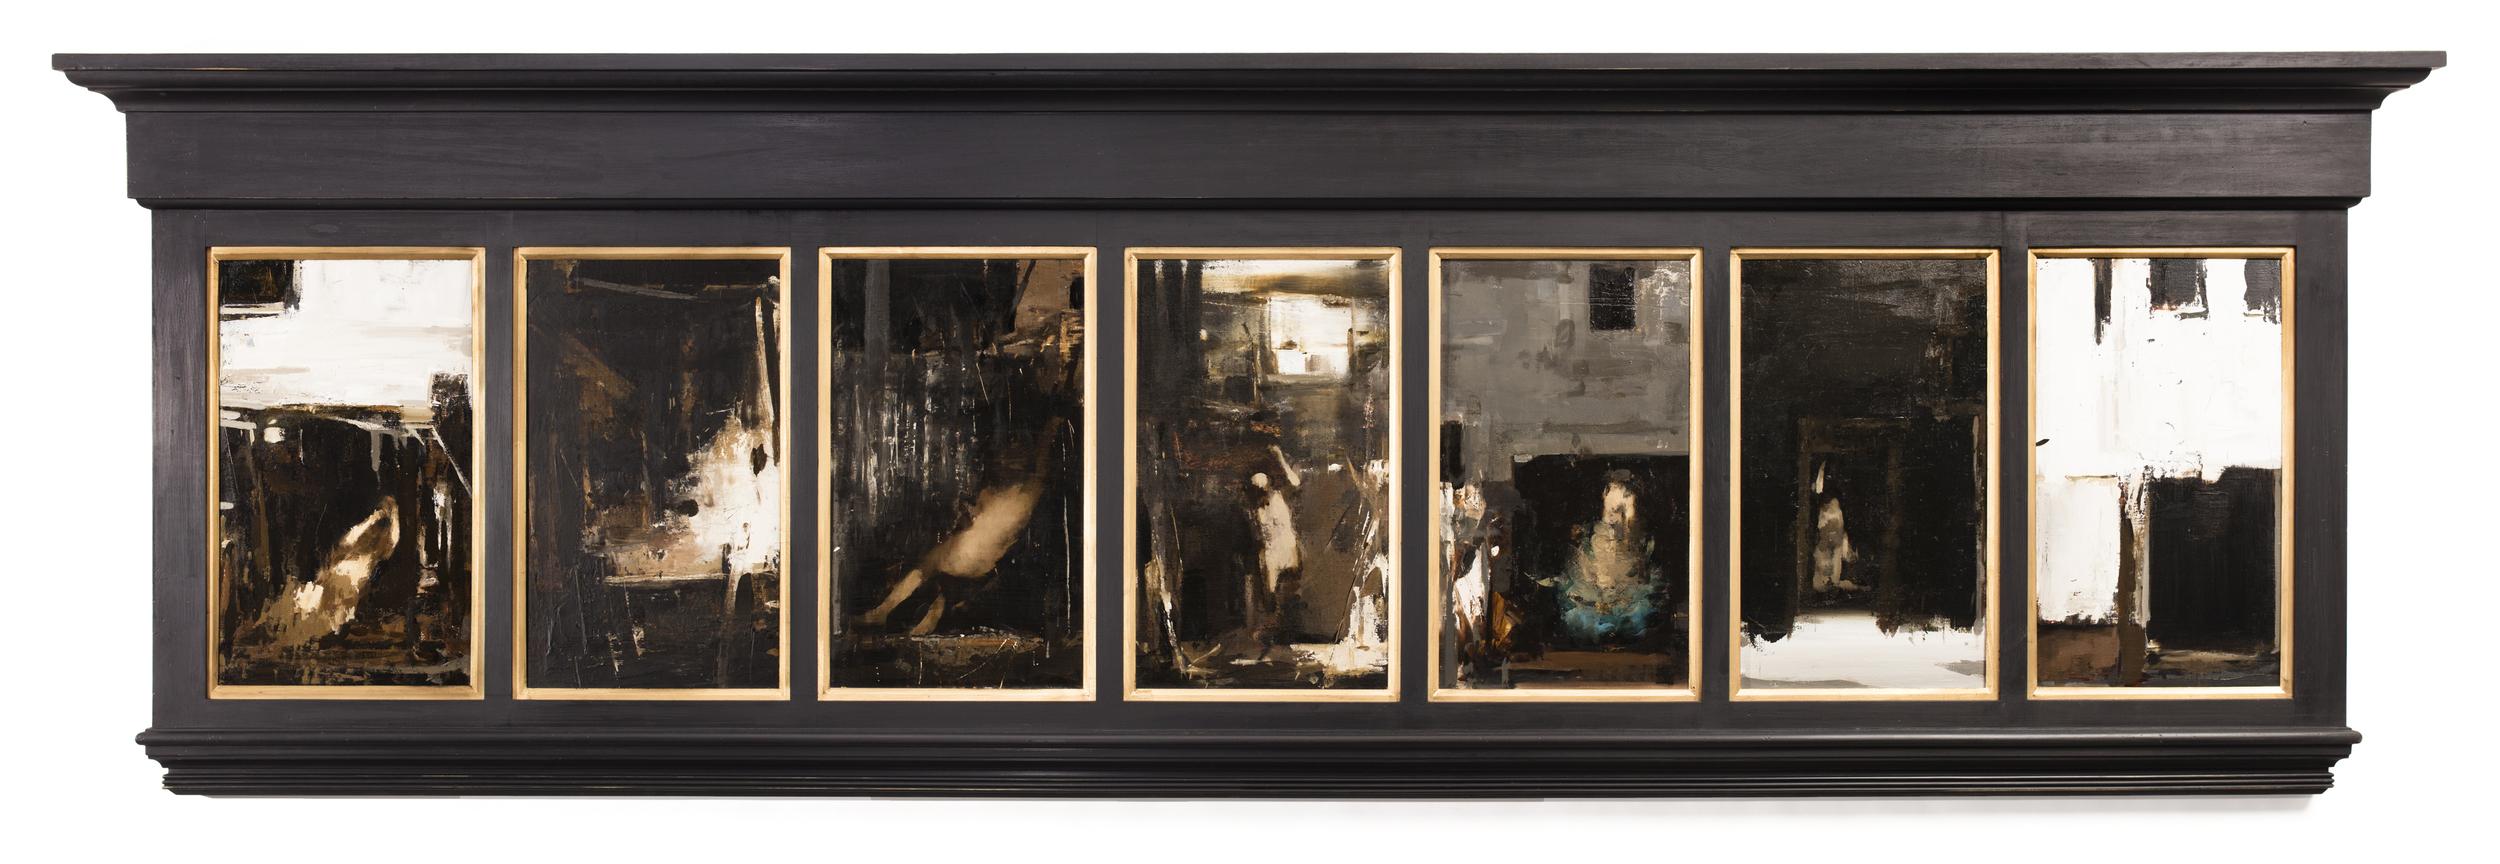 "Peccata Mortalia,  2015  | 11"" x 22"" (each) - 34"" x 107"" (framed)| Seven oils on varied supports"